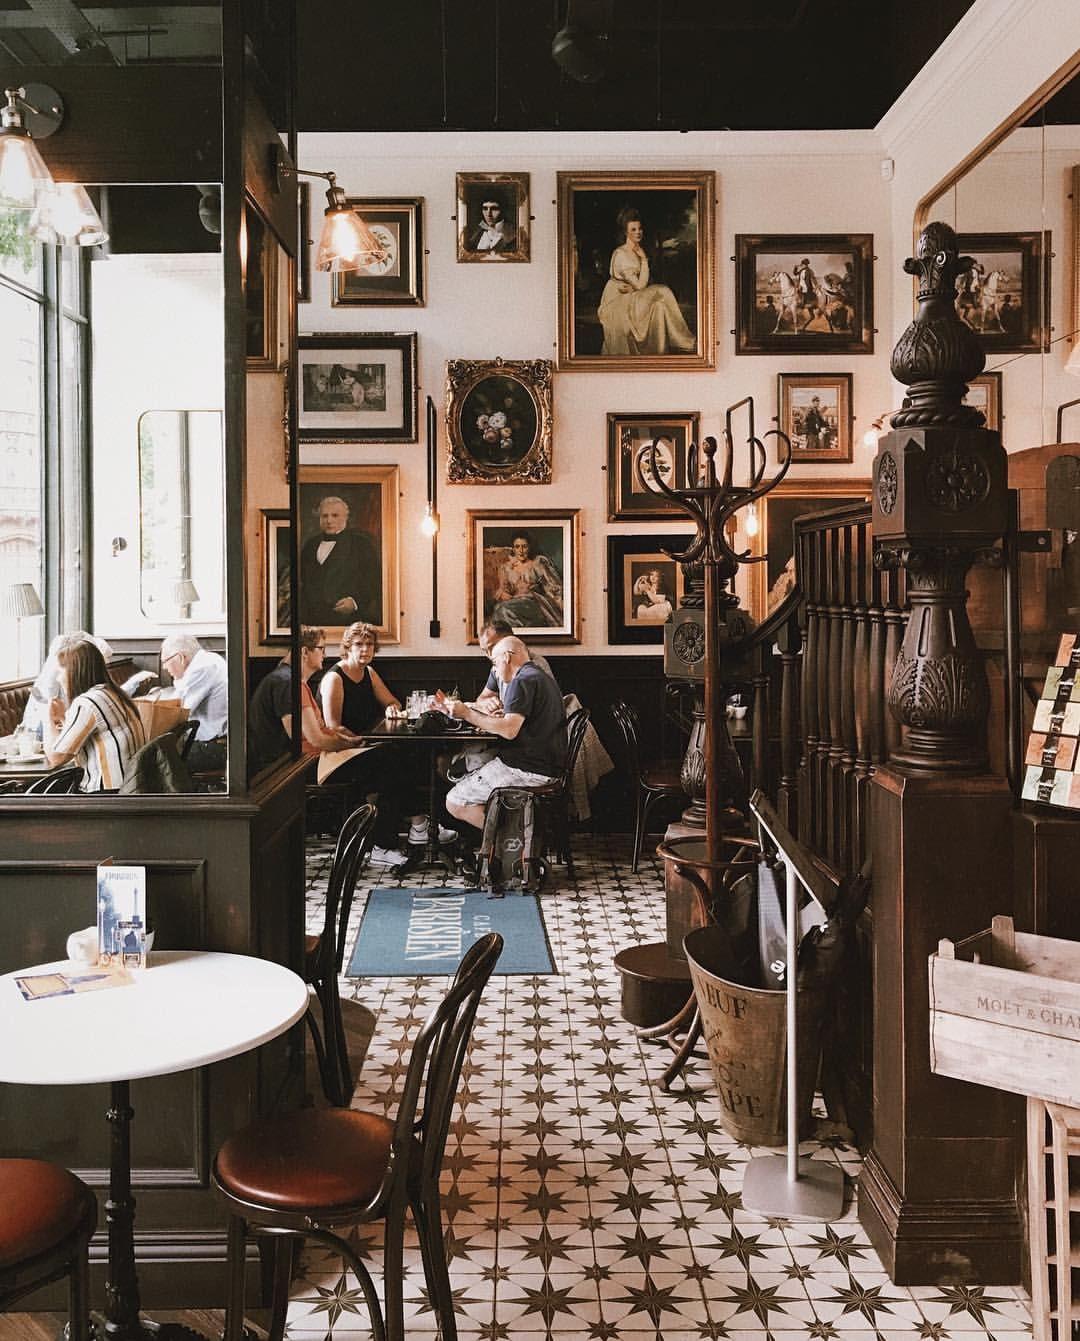 Beautiful Café Parisien inspired by the 20st class café on Titanic ...